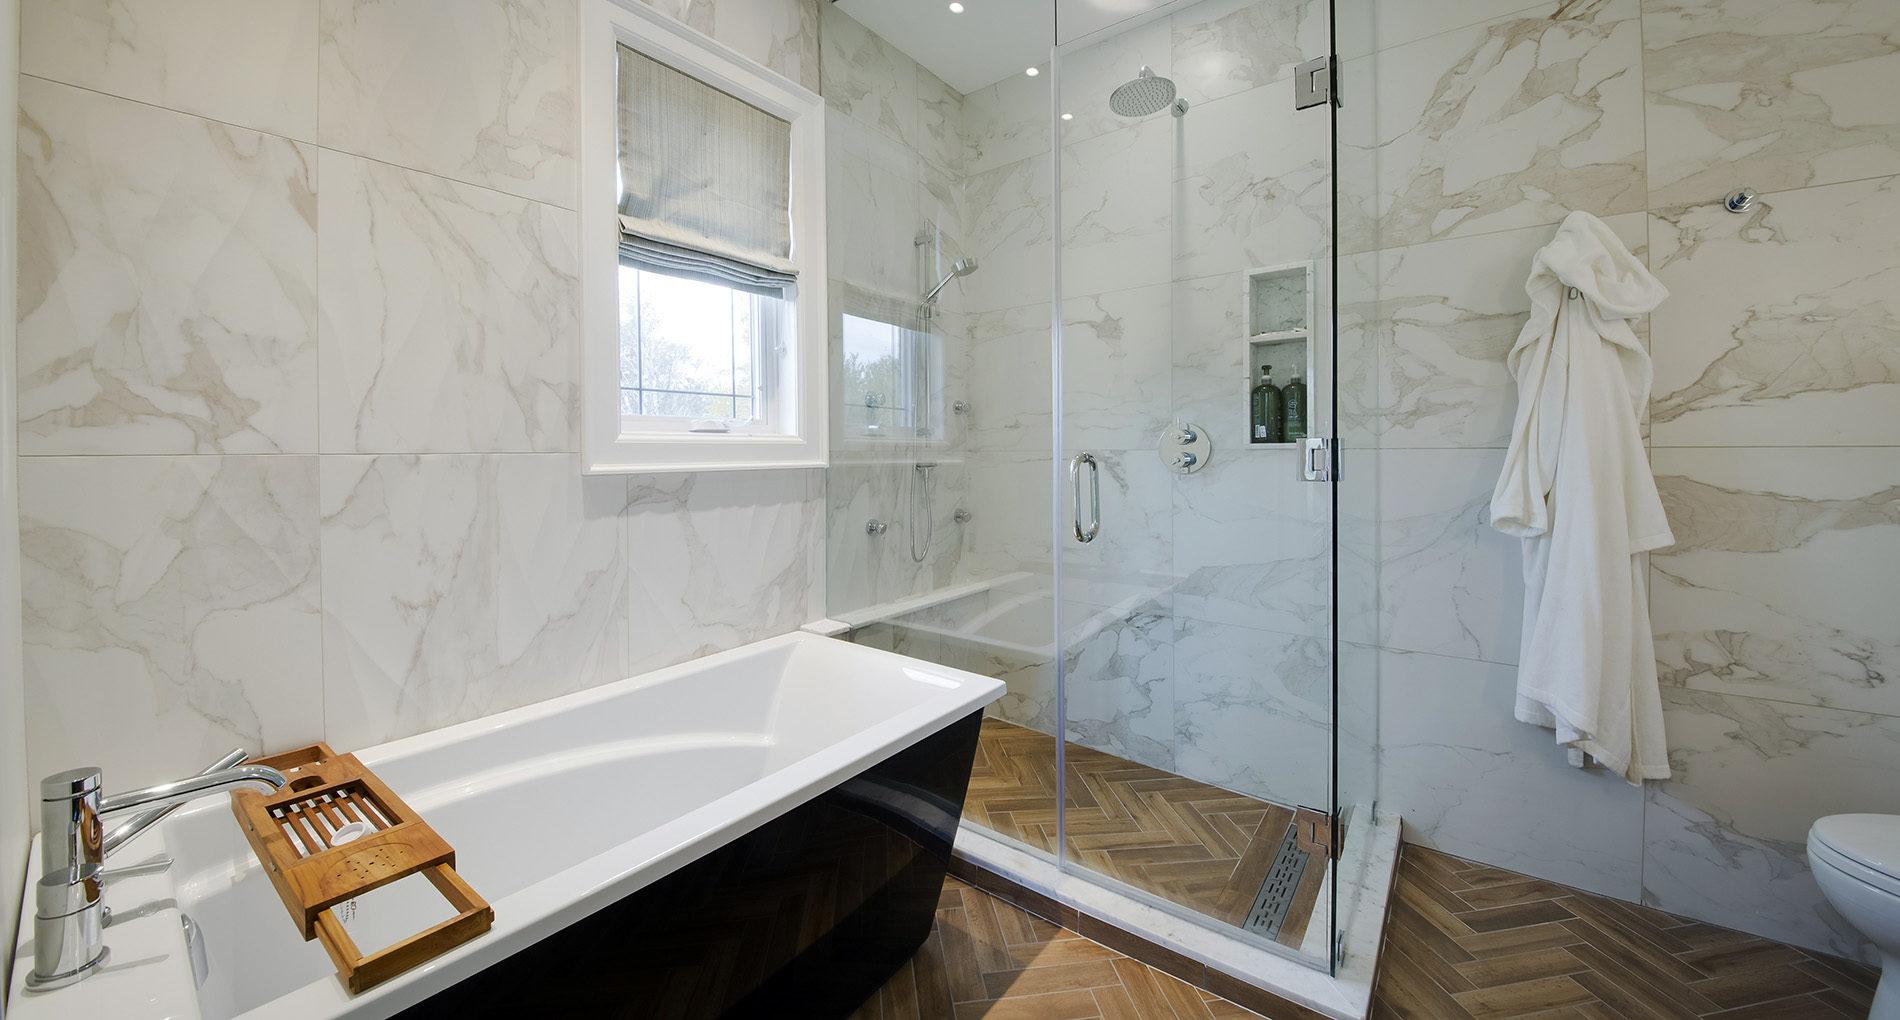 Bathroom Renovation Foresthill Garner Slider